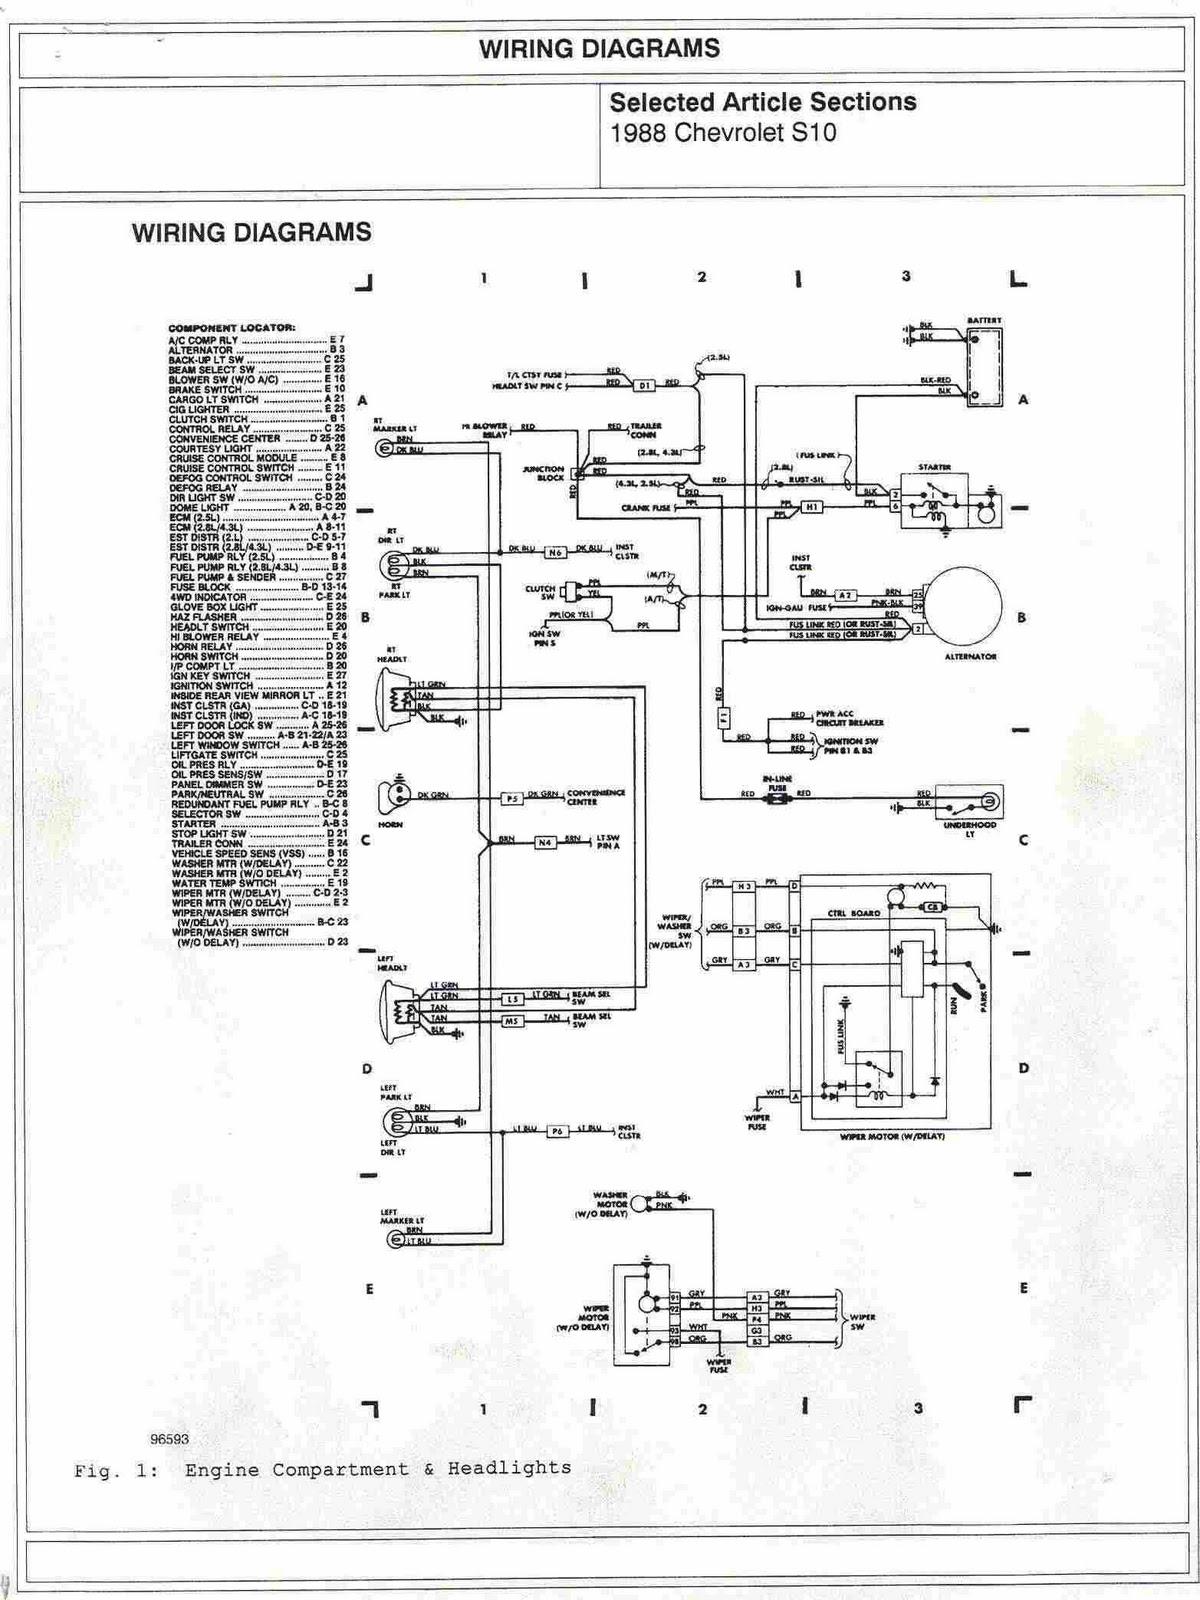 2002 acura rl fuse box 1996 acura rl fuse box wiring. Black Bedroom Furniture Sets. Home Design Ideas